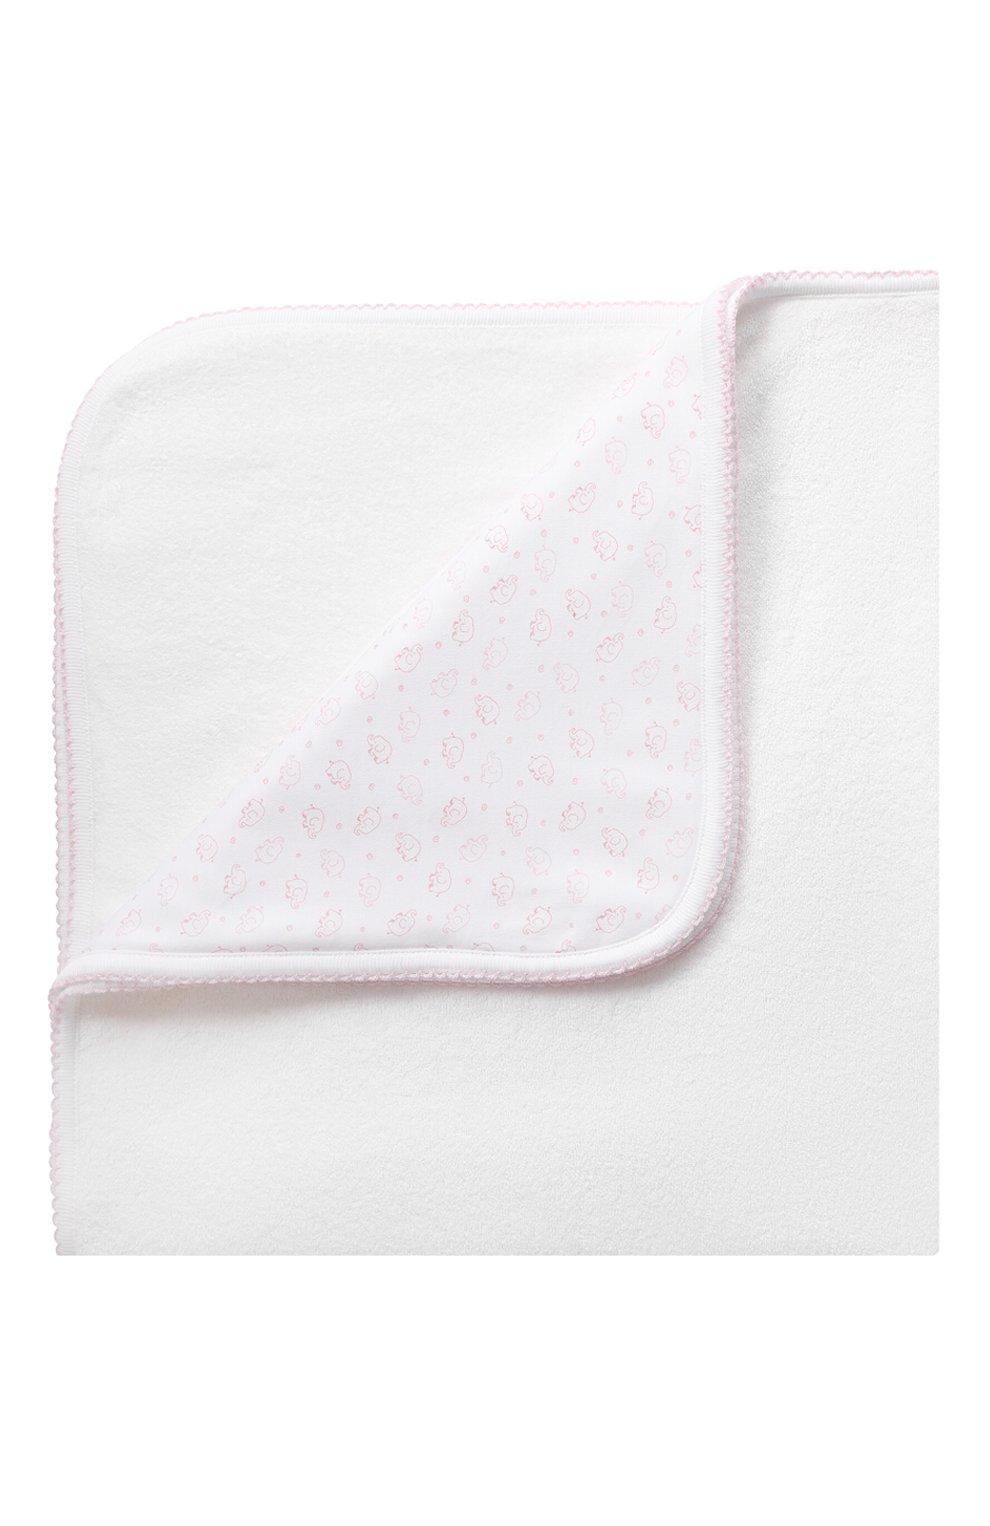 Детского комплект из полотенца и рукавицы KISSY KISSY розового цвета, арт. 48609 | Фото 4 (Материал: Текстиль, Хлопок)